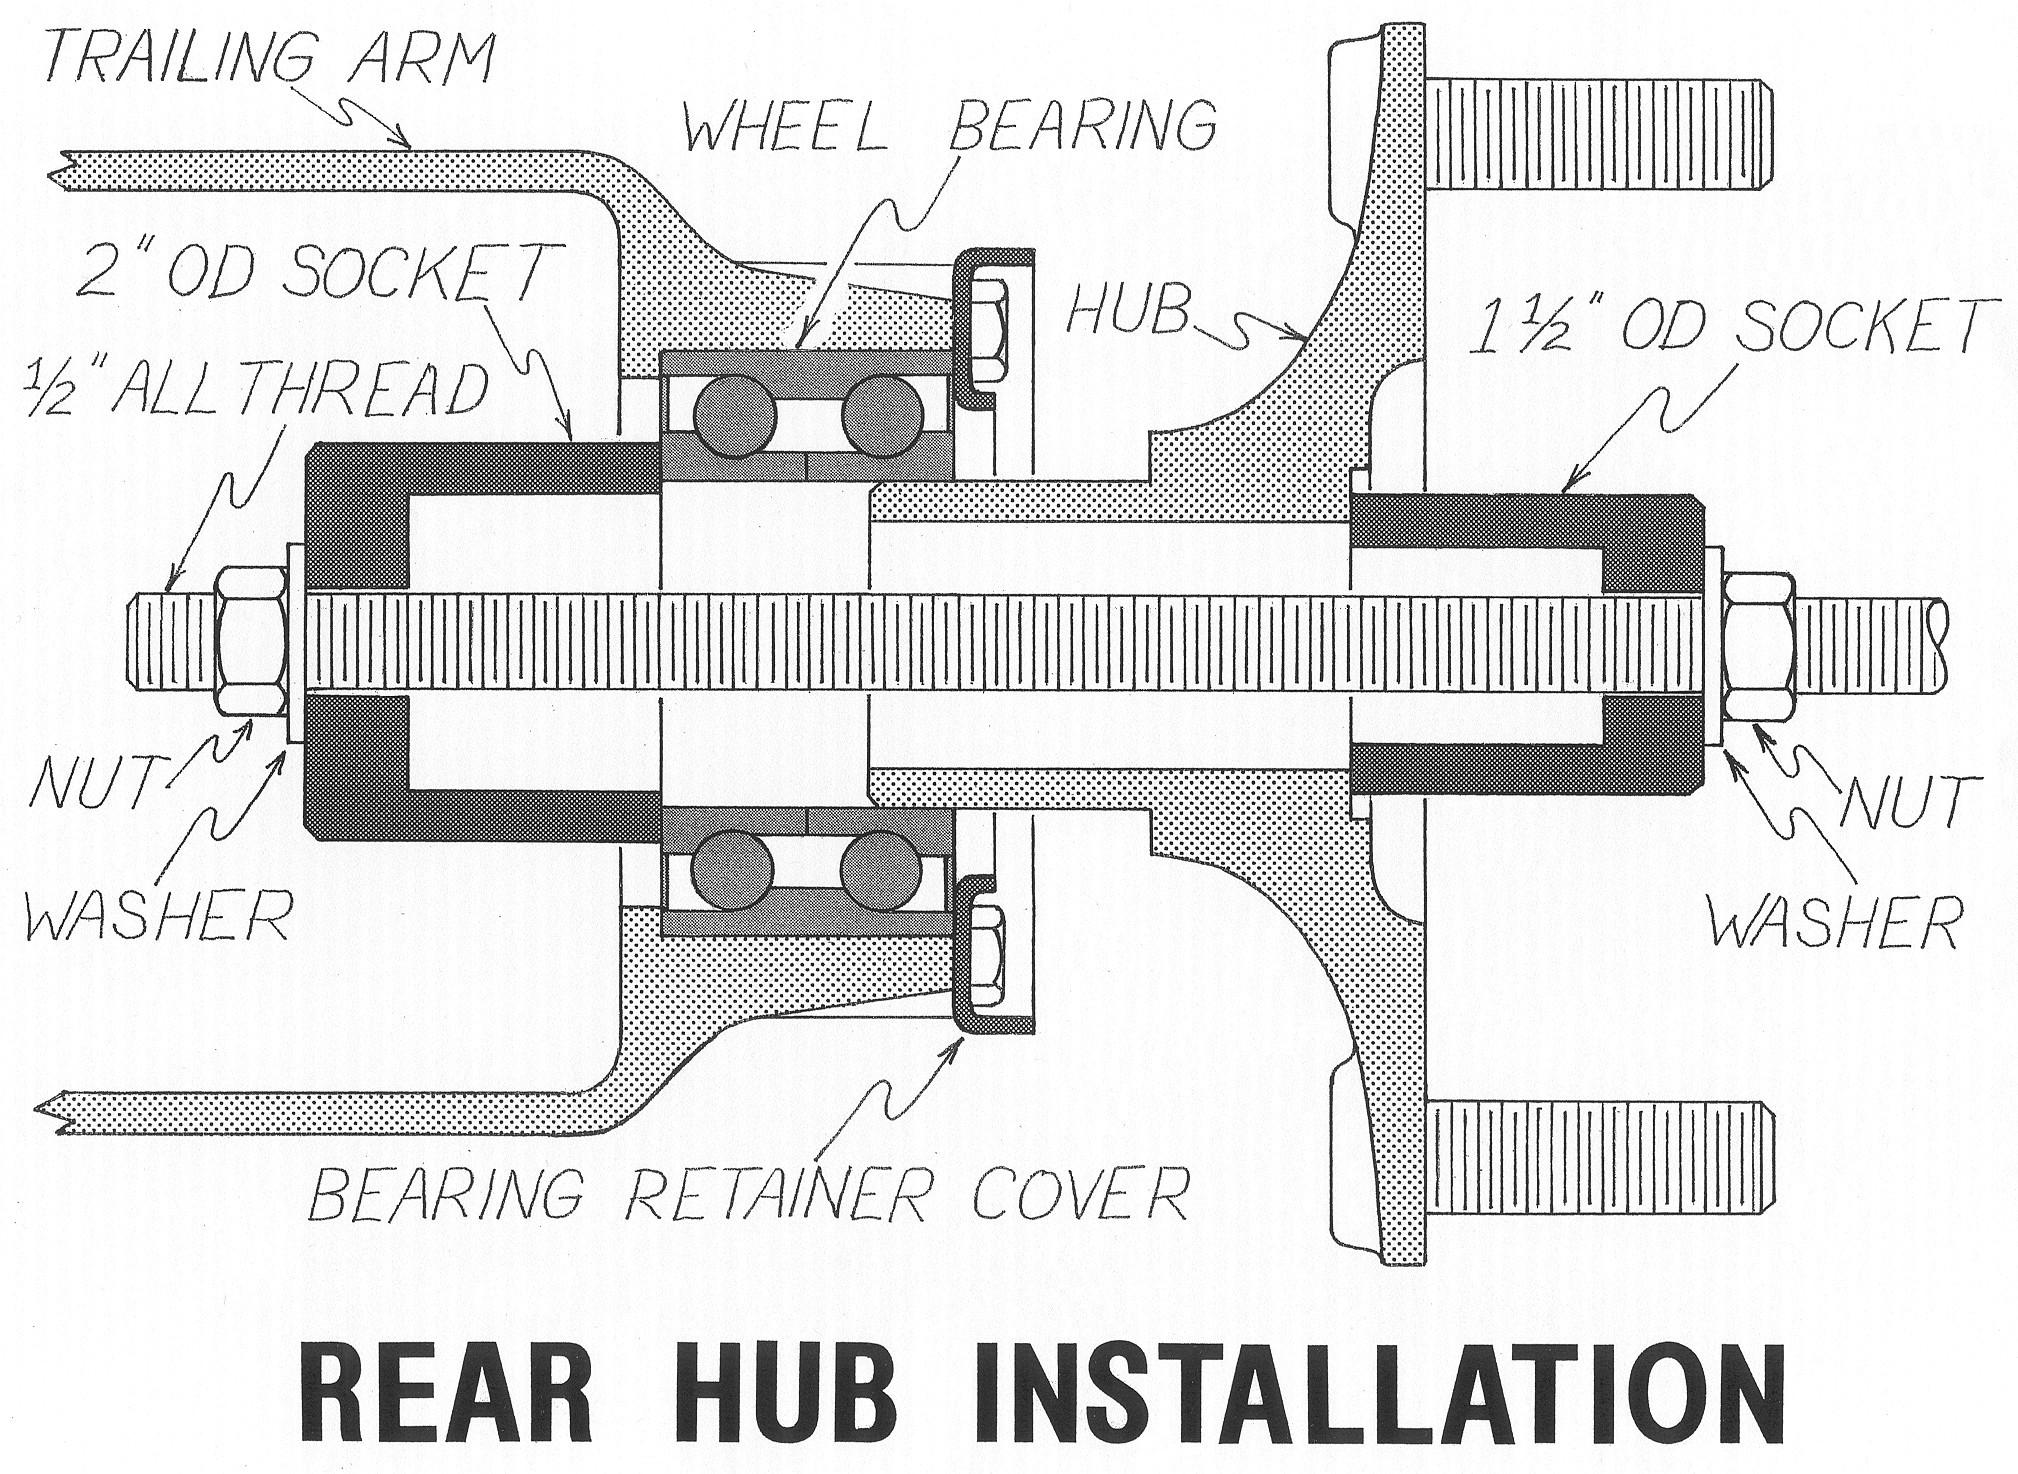 Car Front Axle Diagram Pelican Technical Article 914 Five Bolt Pattern Conversion Of Car Front Axle Diagram